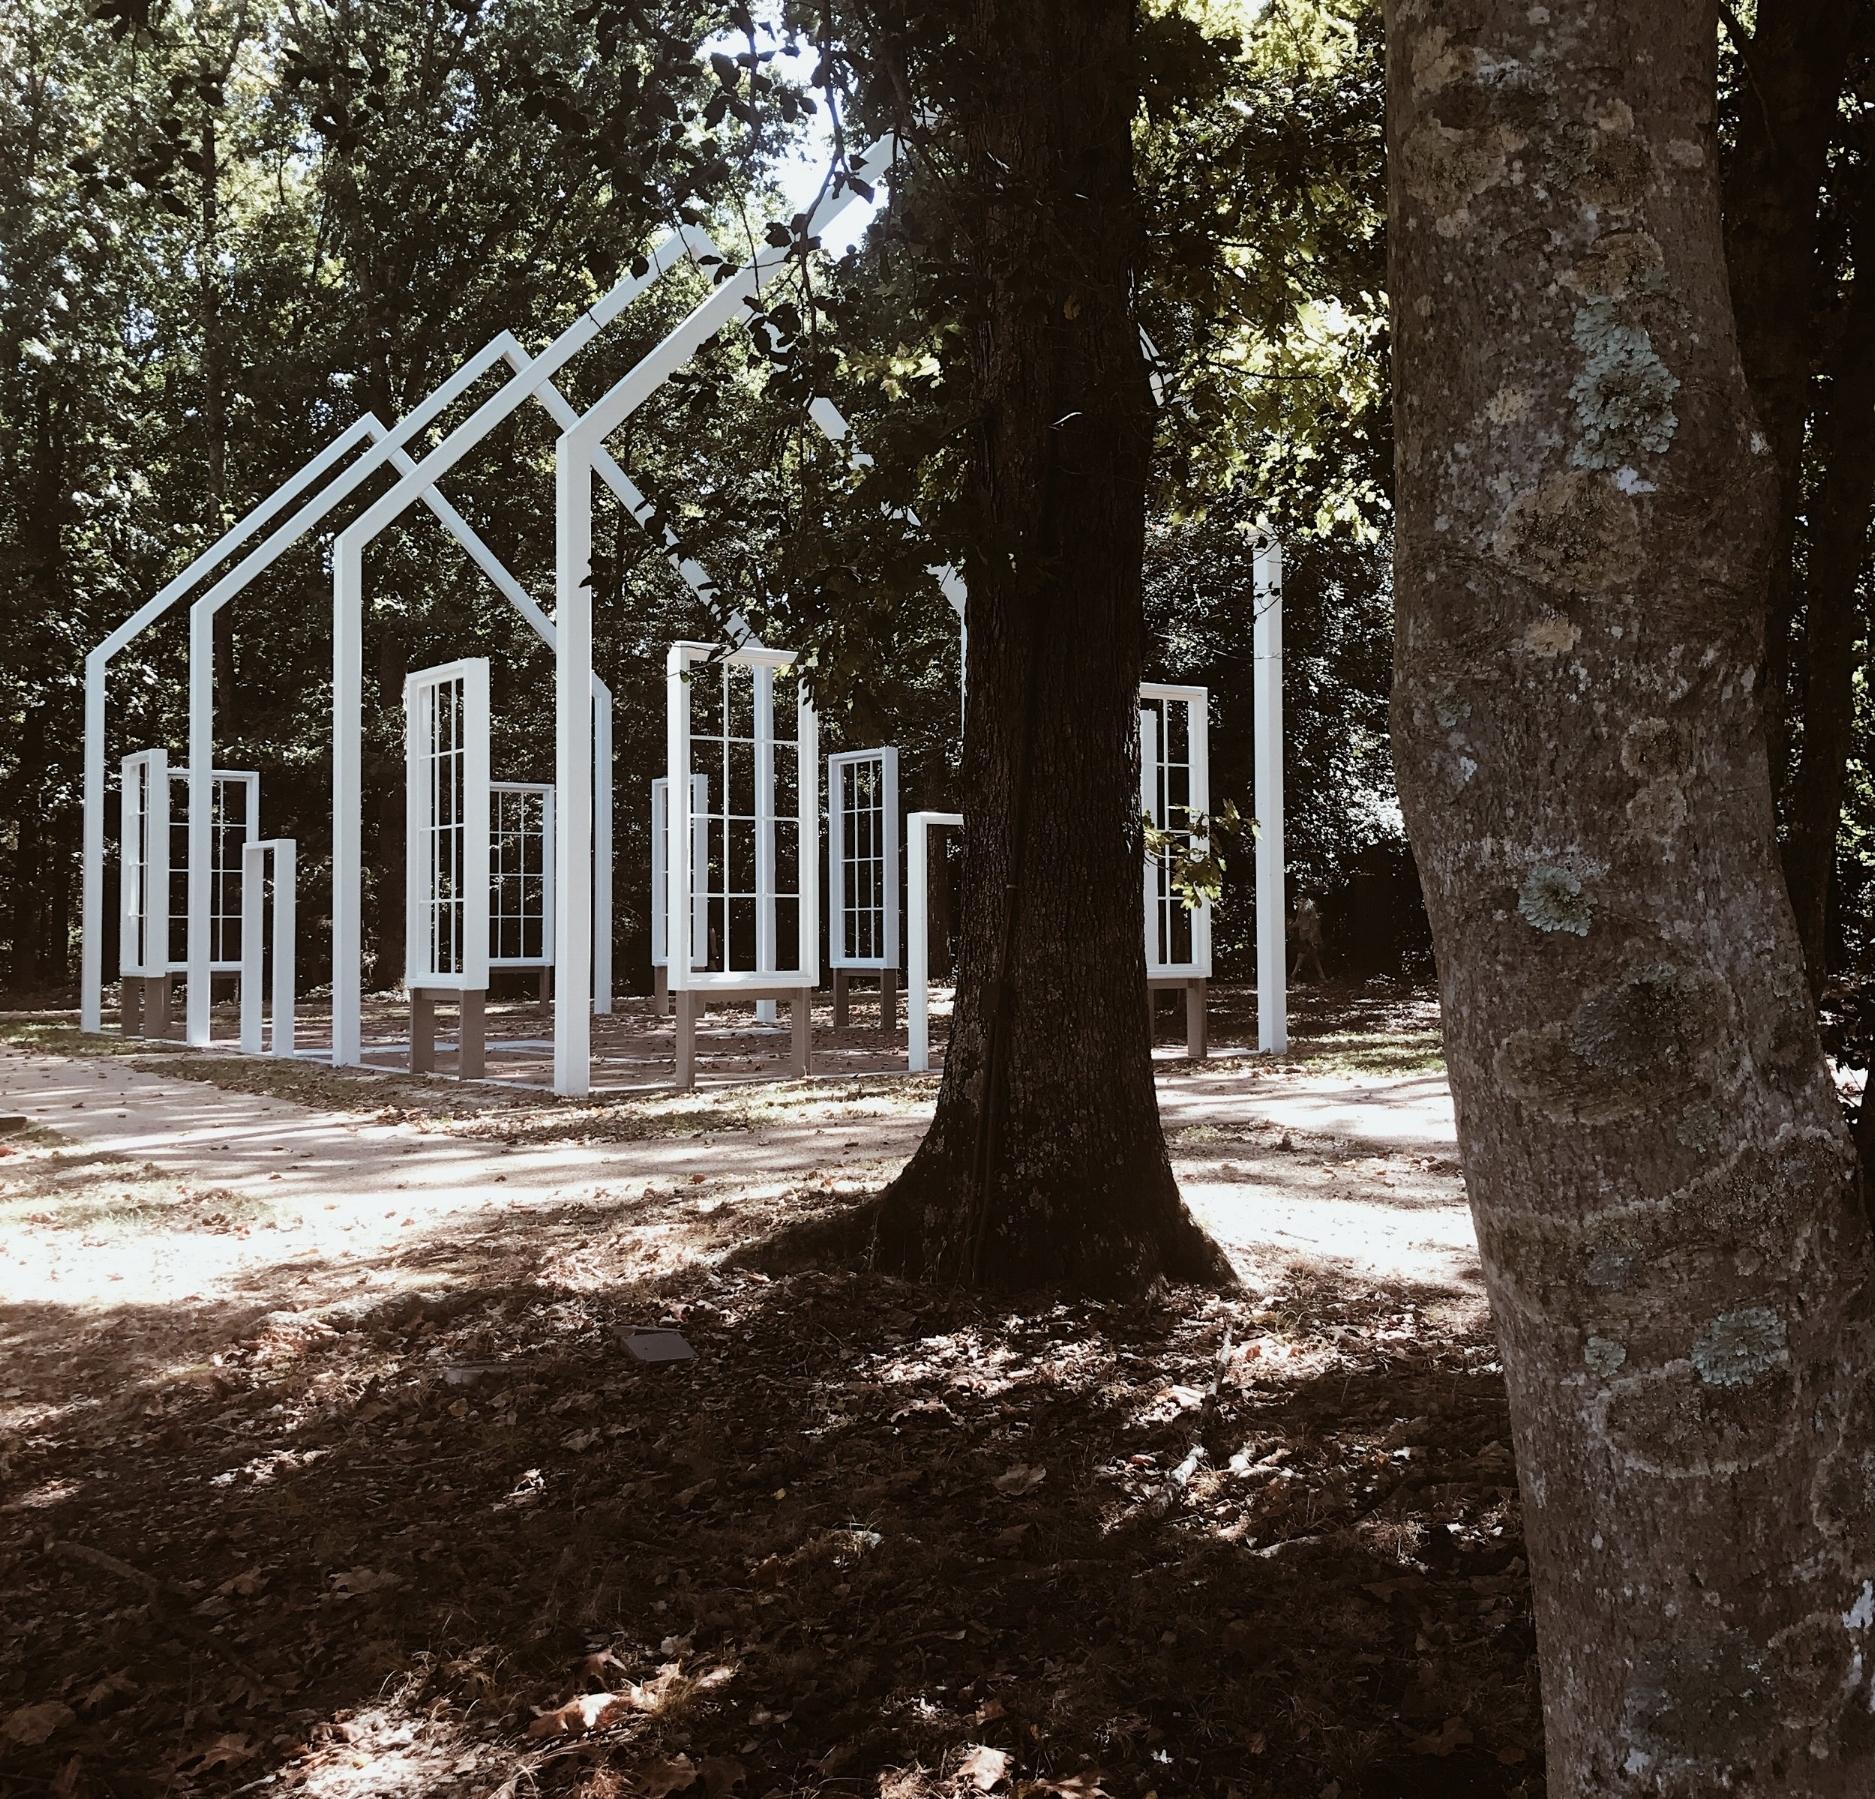 The Polegreen church -